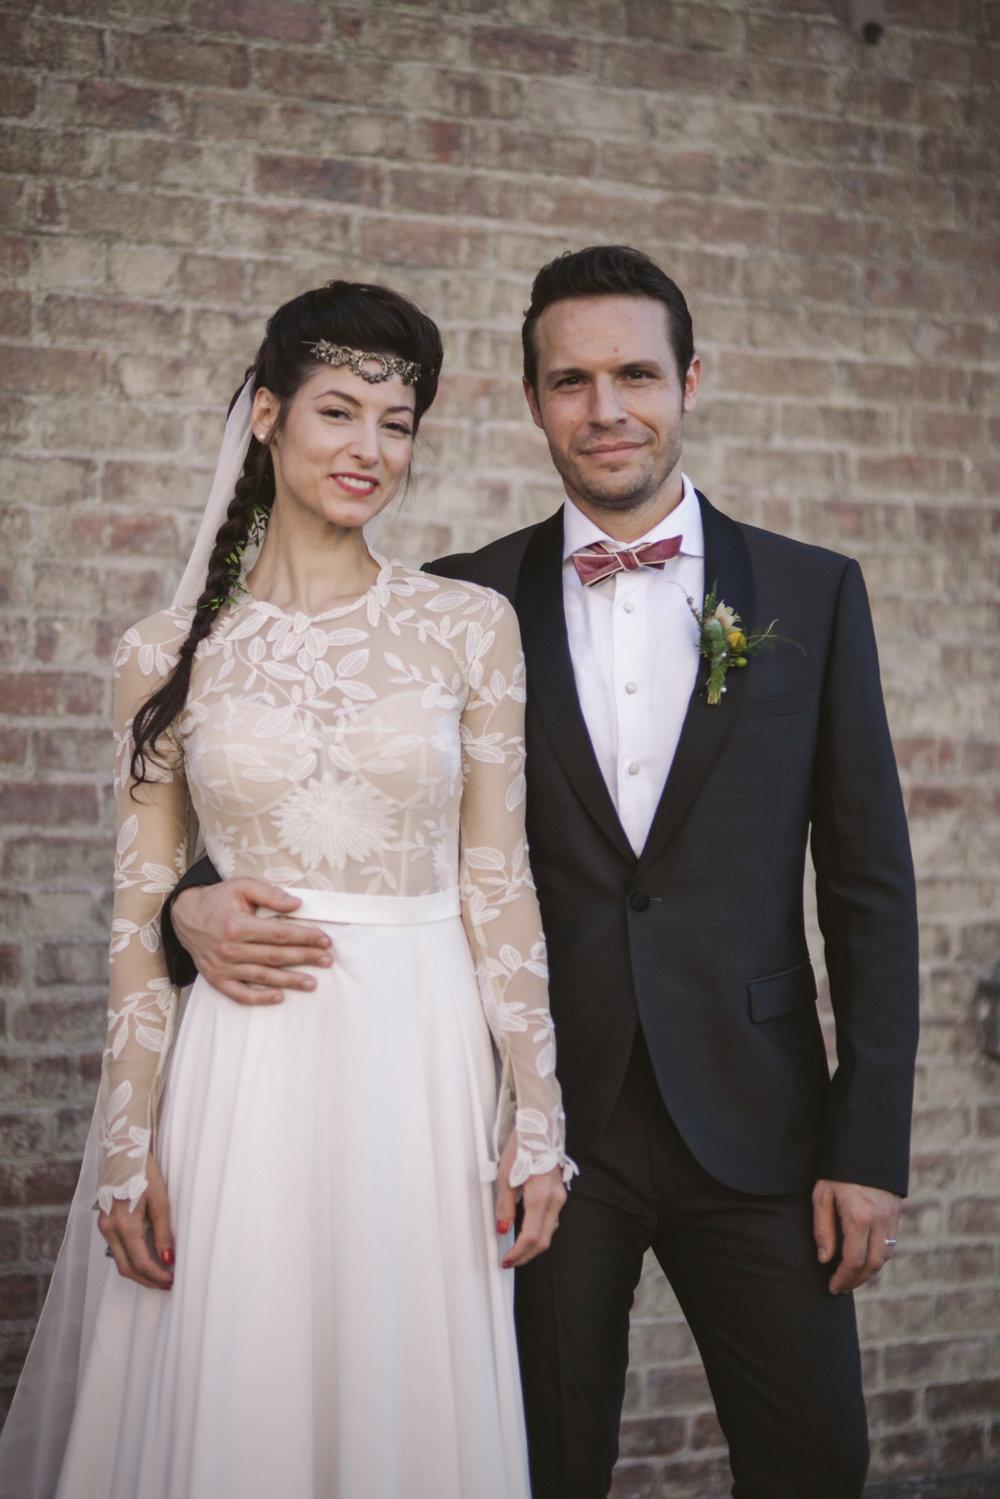 Kimberly-Coccagnia-Wedding-Photographer-143.JPG